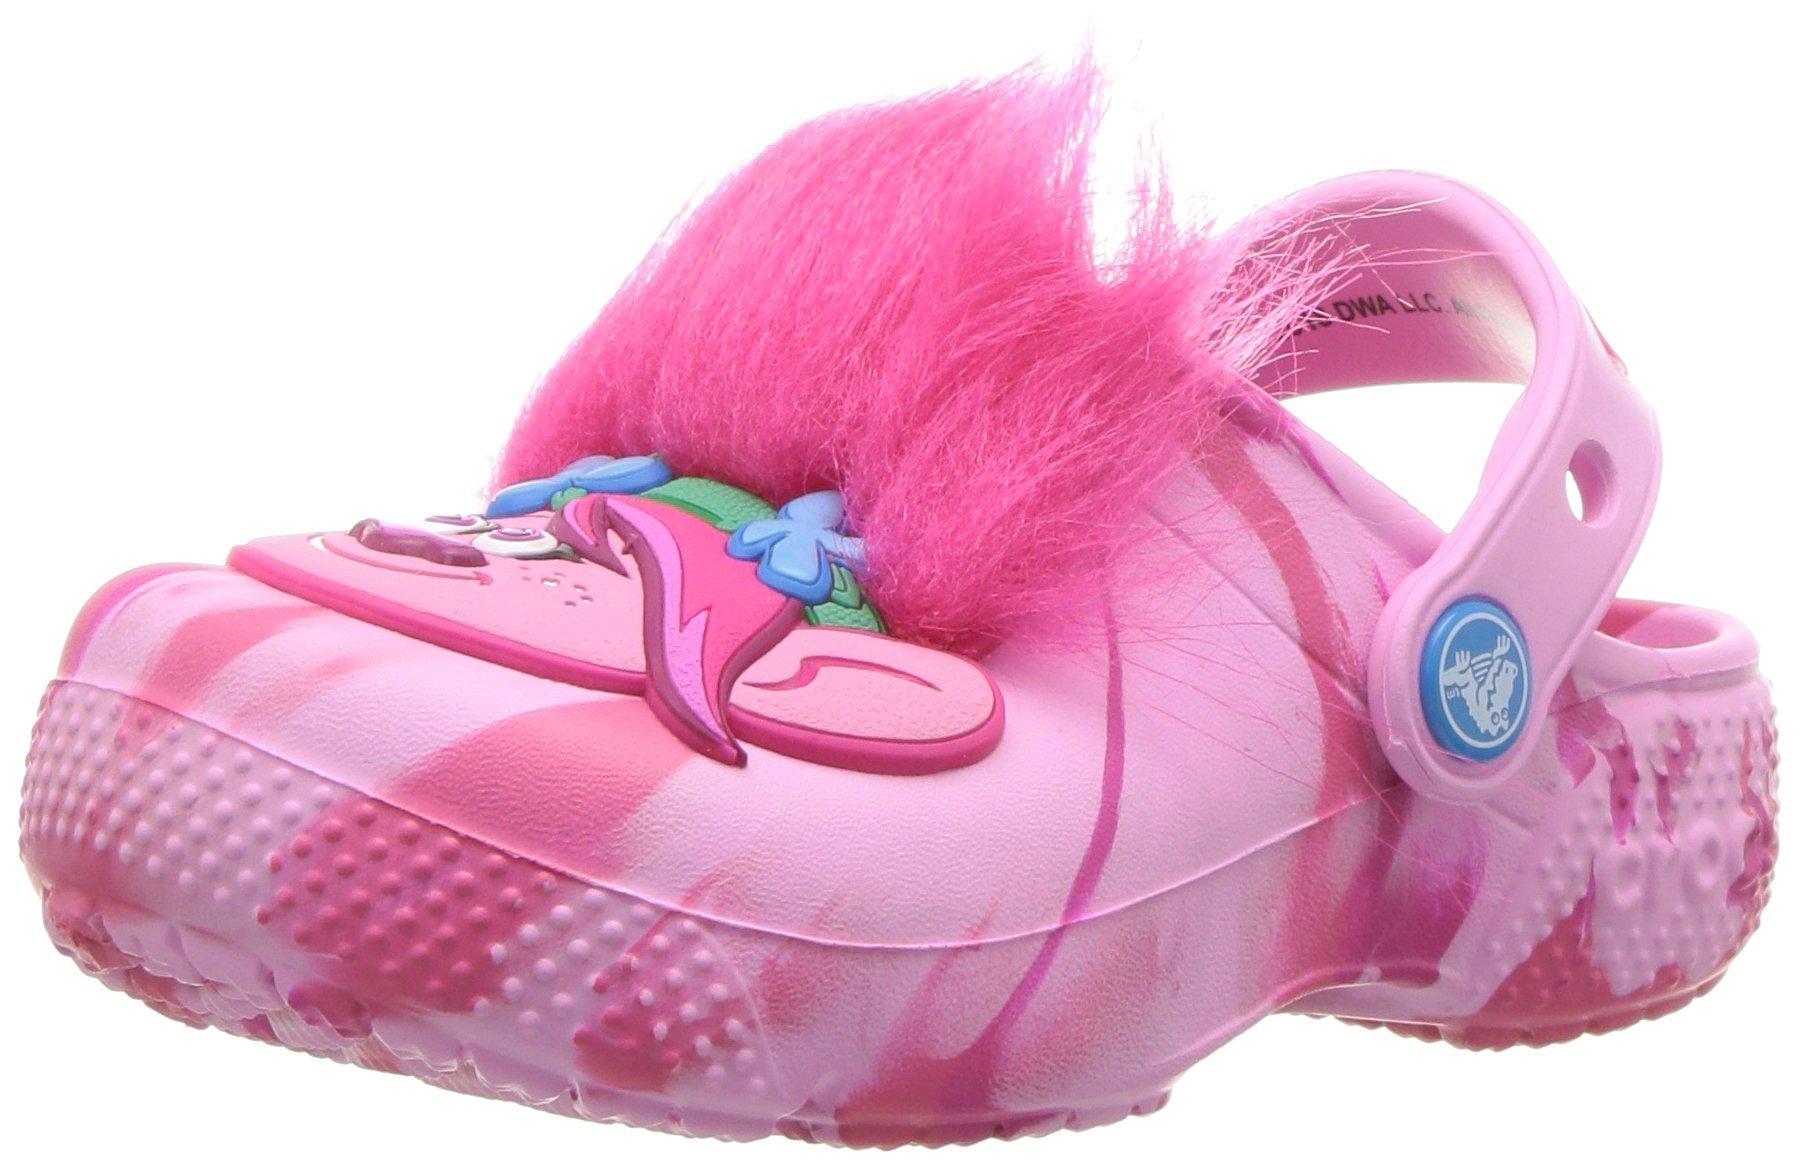 Crocs Unisex Fun Lab Trolls Clog K, Party Pink, 11 M US Little Kid